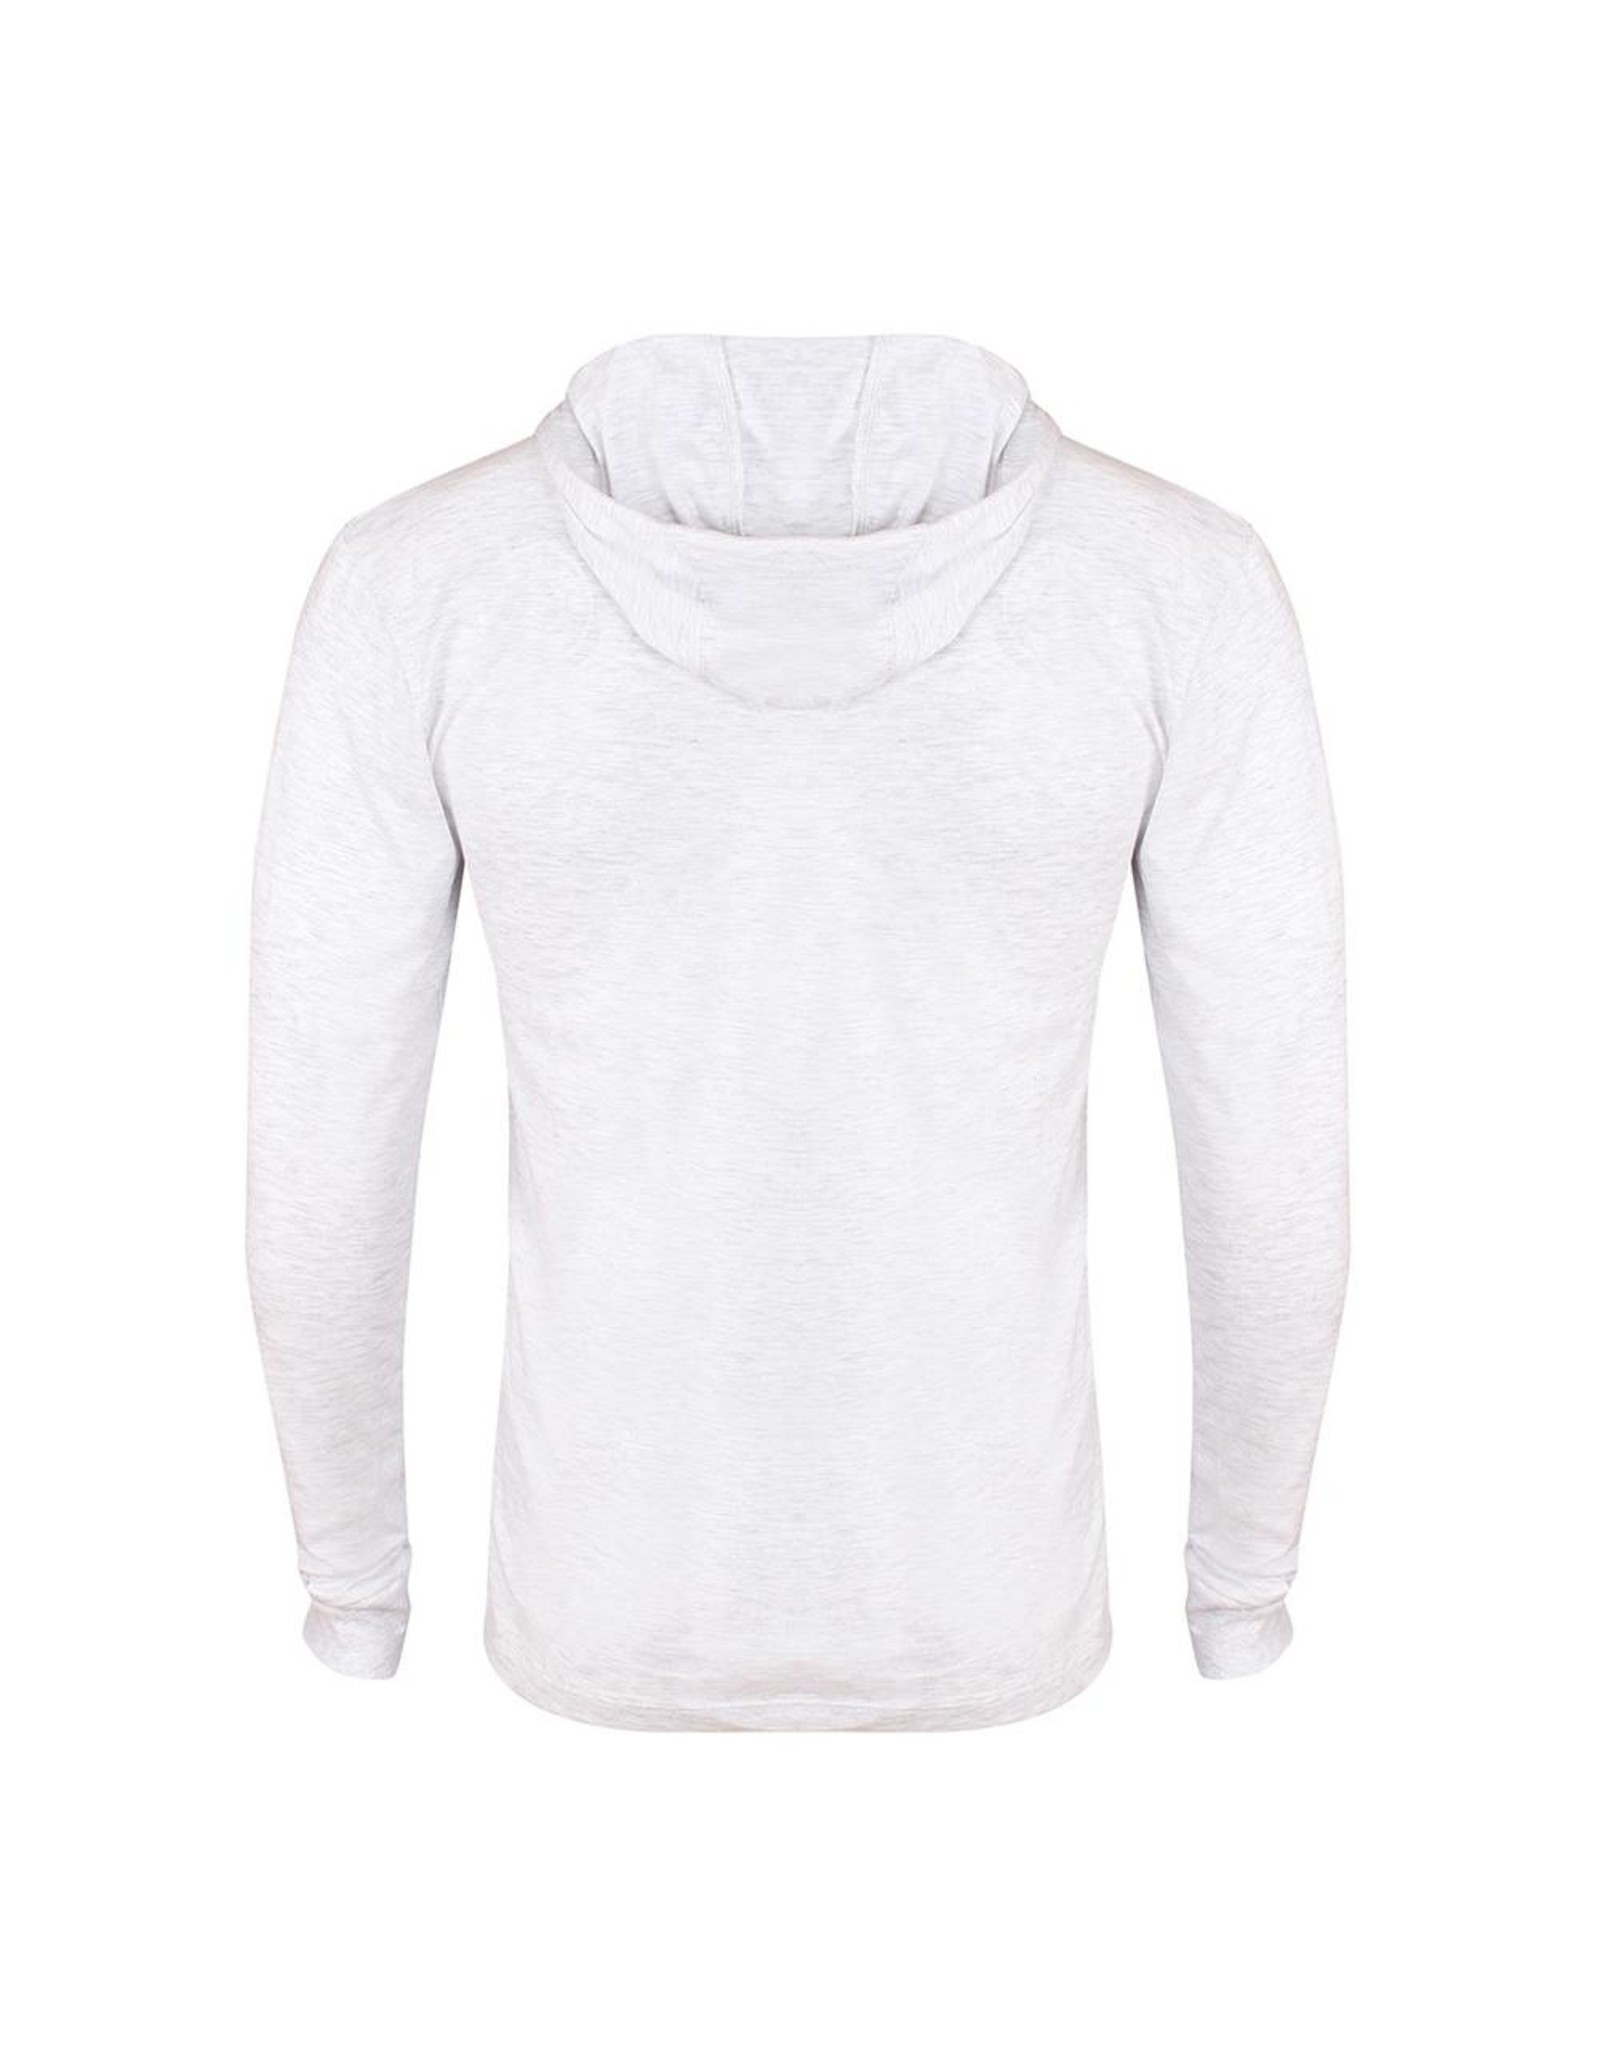 Gold's Gym Muscle Joe Long Sleeve Hooded T-shirt - Vintage White Marl